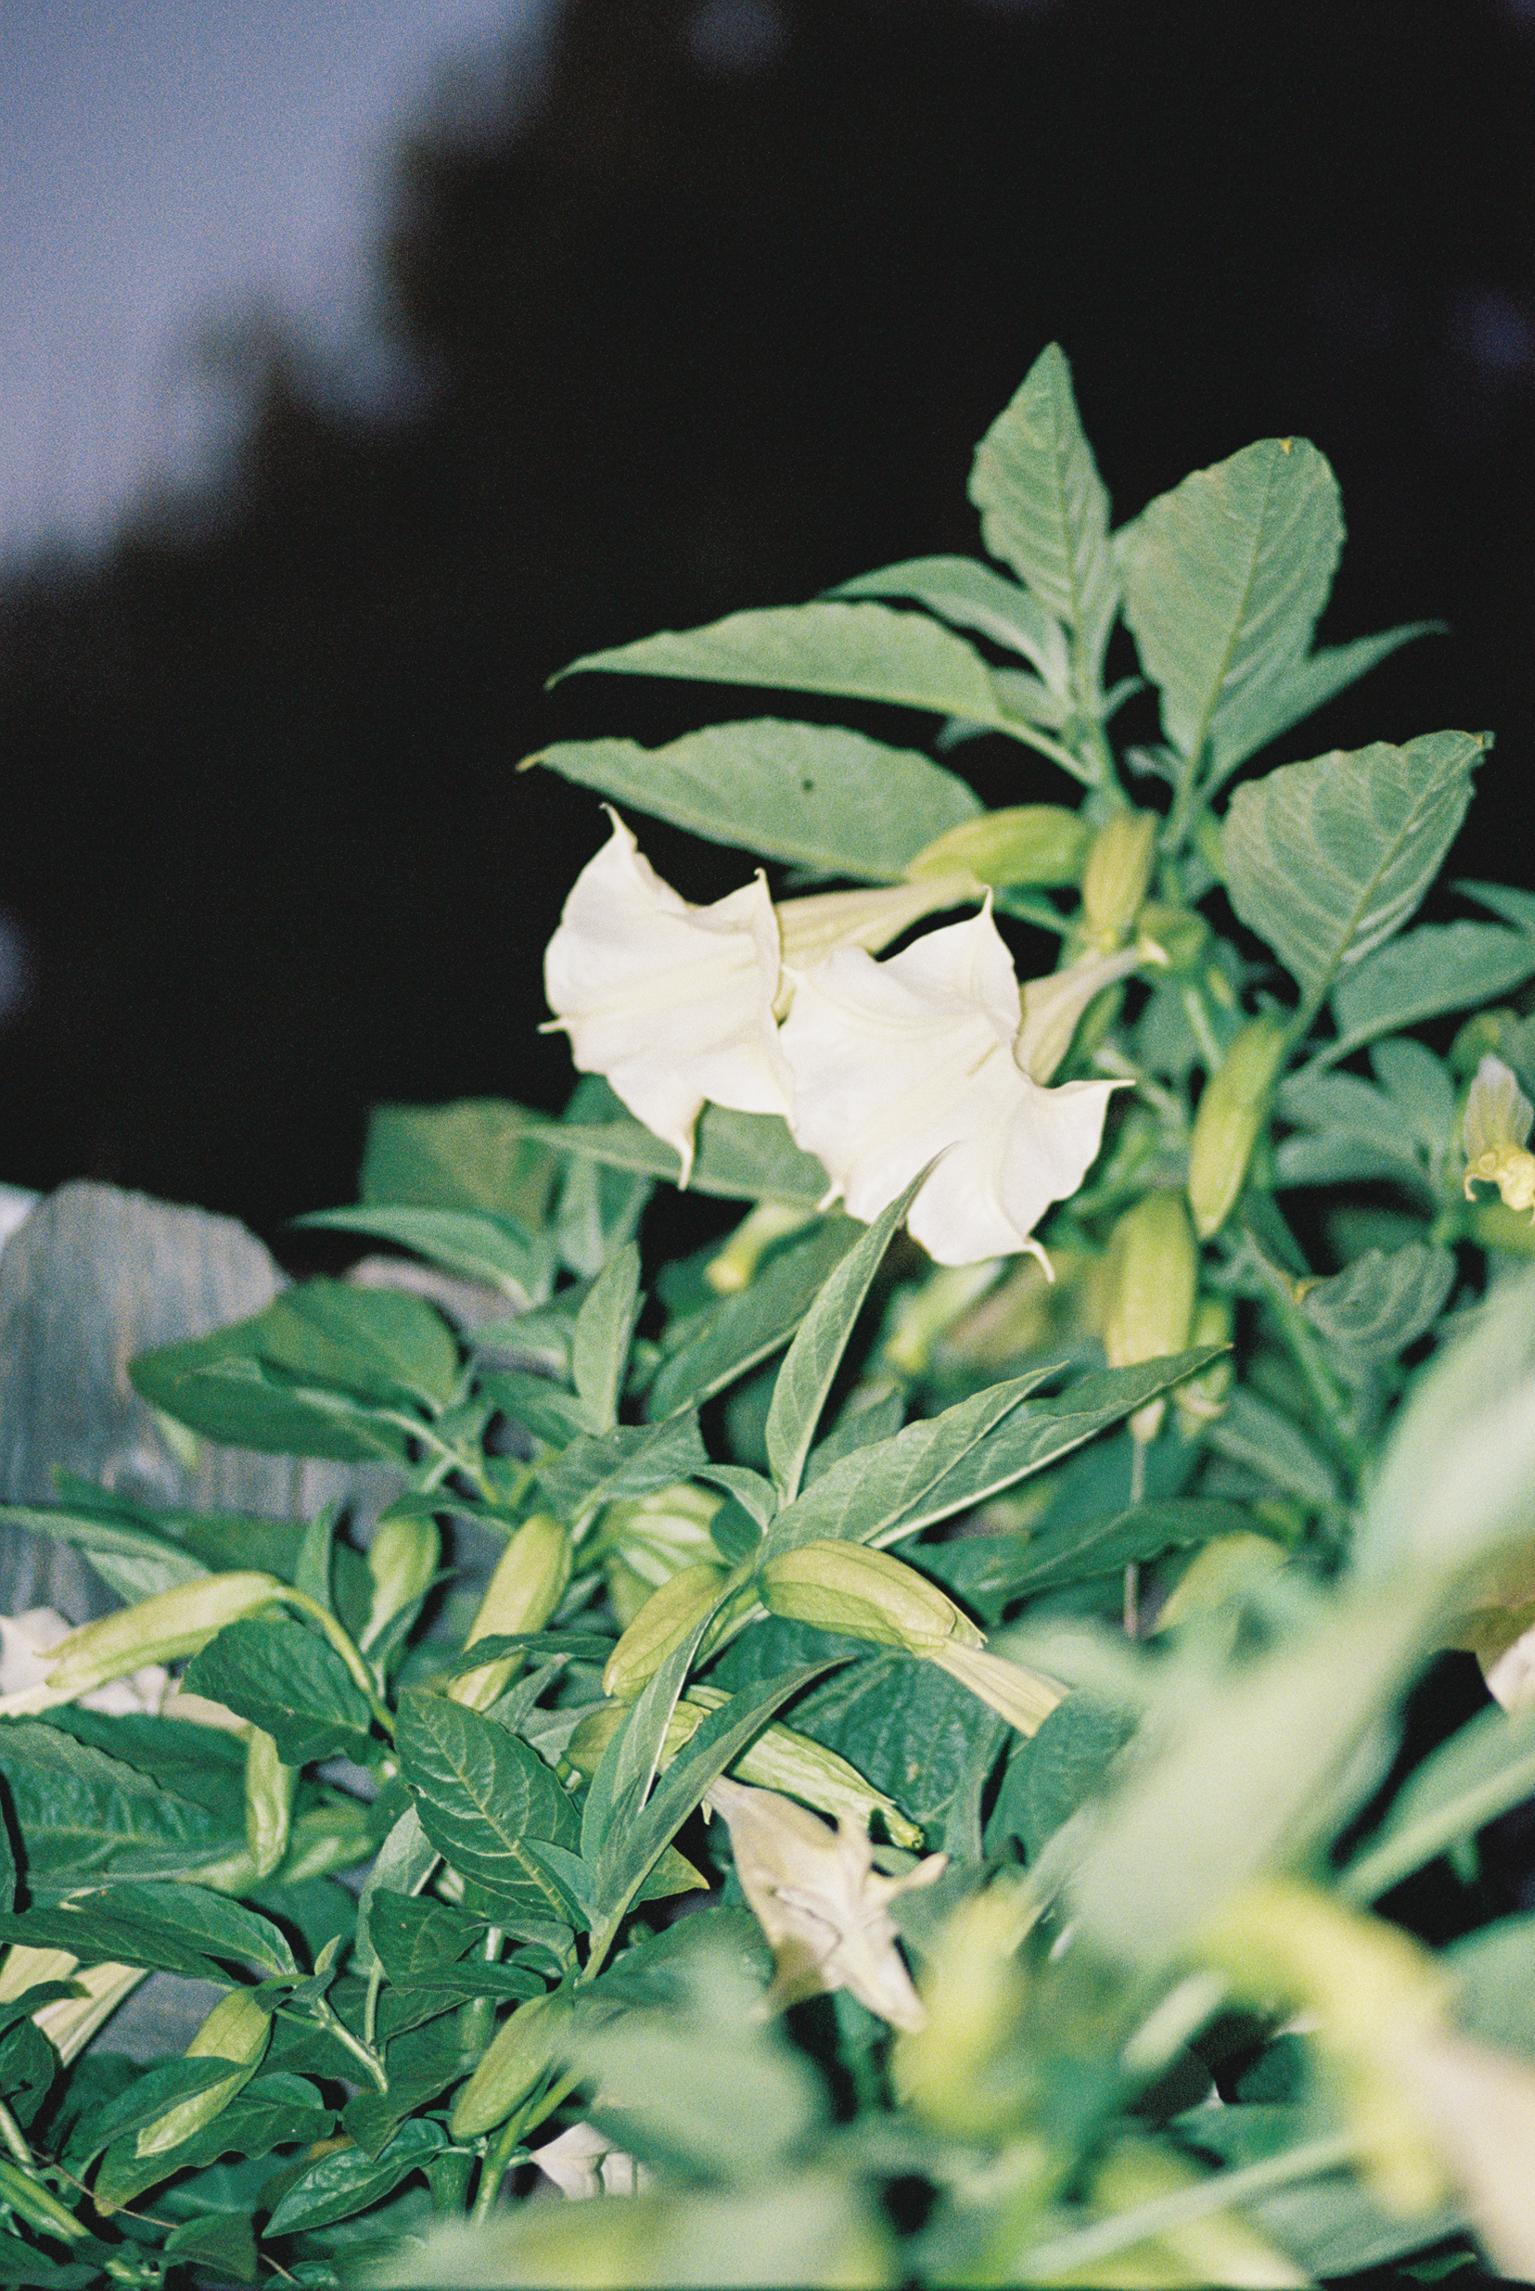 film_california_plants_2019_lind138-001.jpg